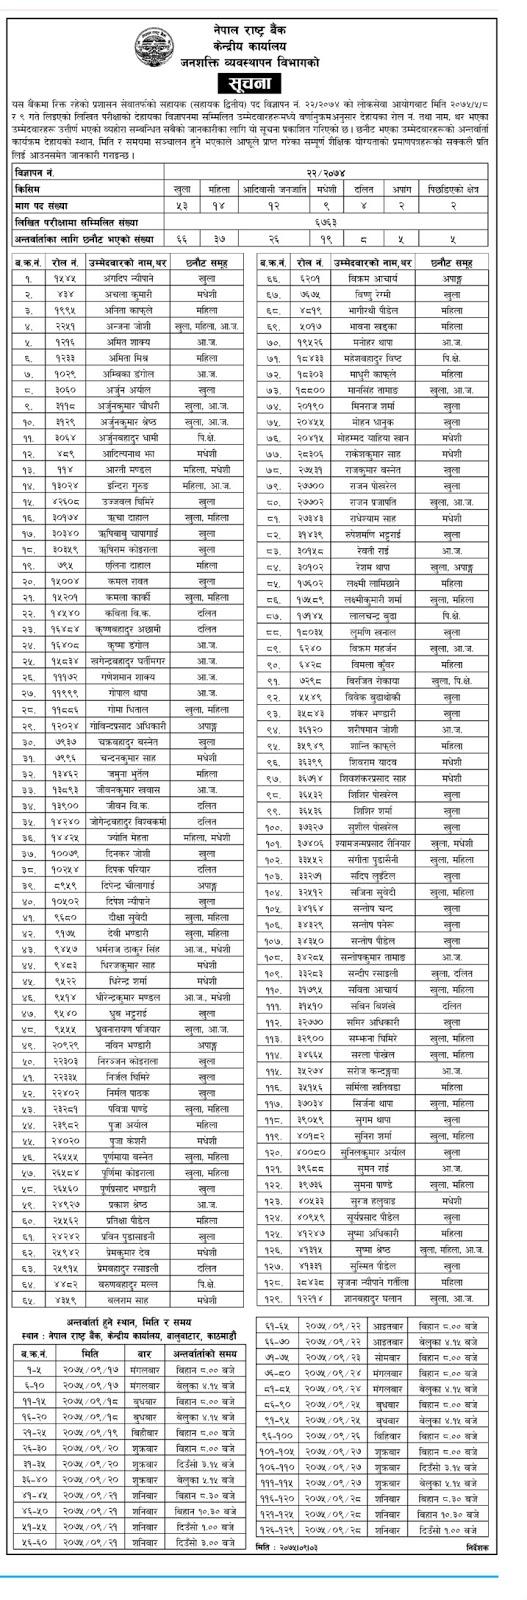 Nepal Rastra Bank - Prashan Sewa Sahayek 2nd - Result Published